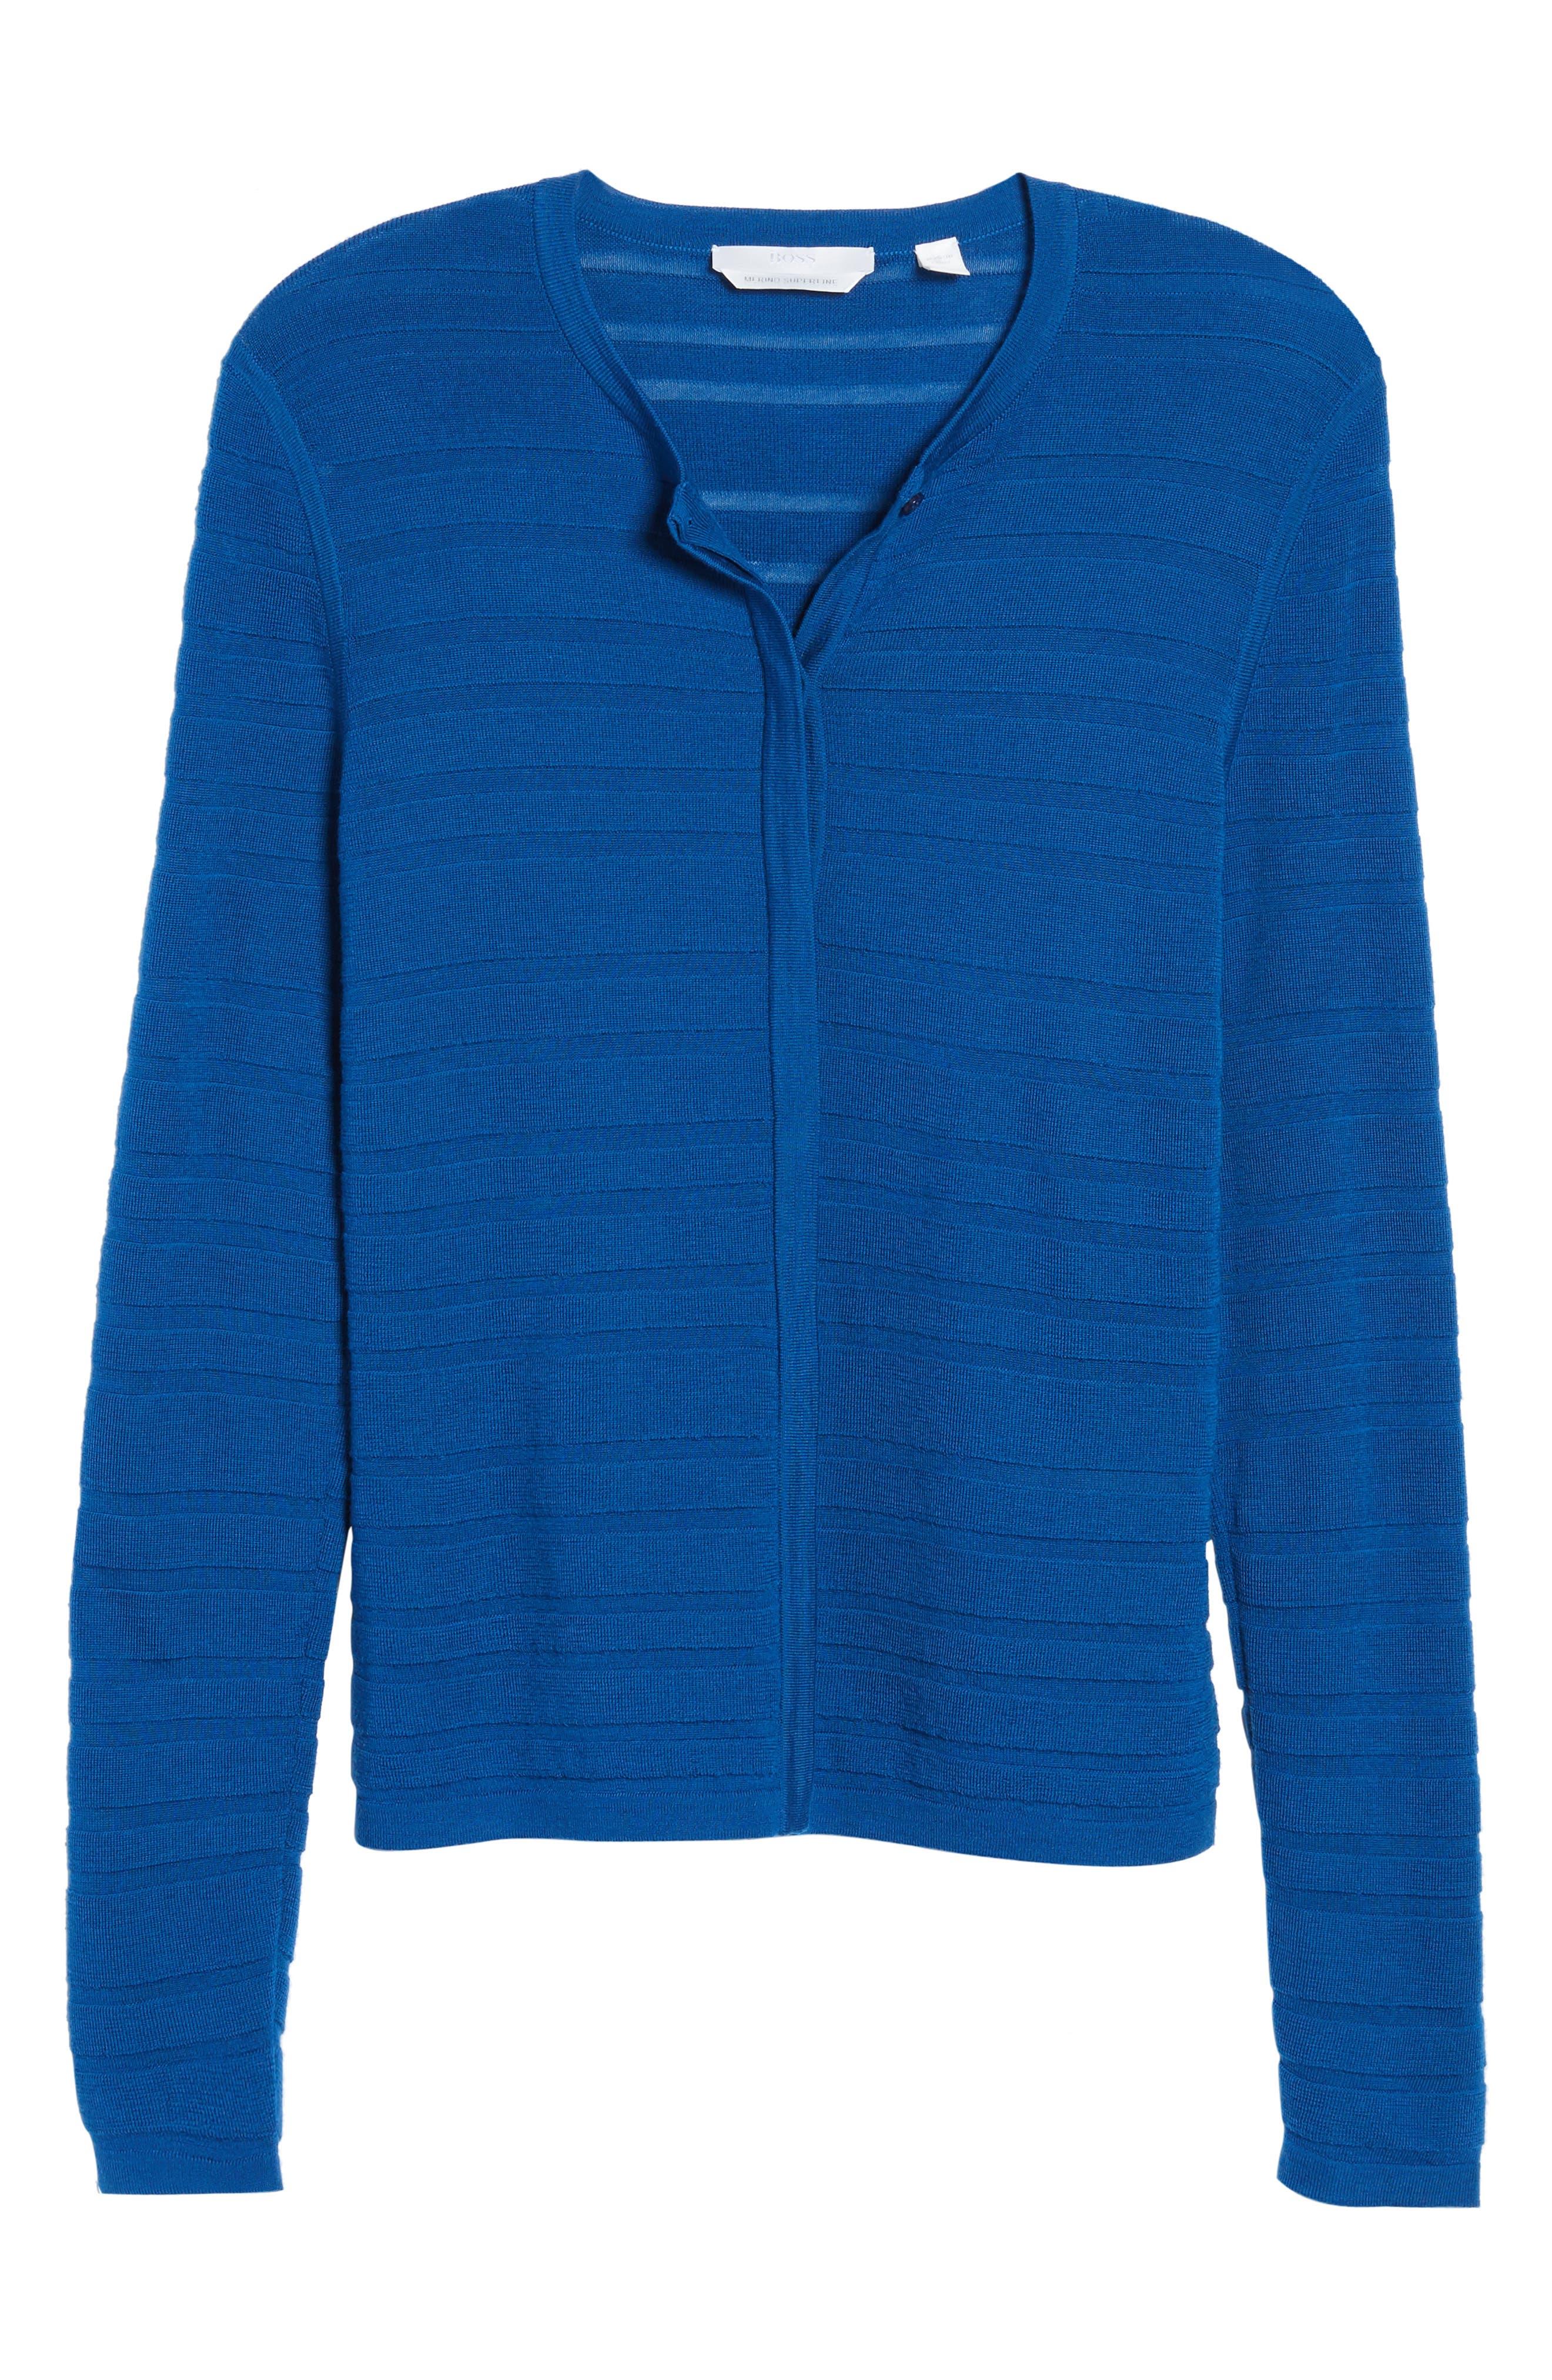 Fahsa Stripe Textured Wool Cardigan,                             Alternate thumbnail 6, color,                             Gentian Blue